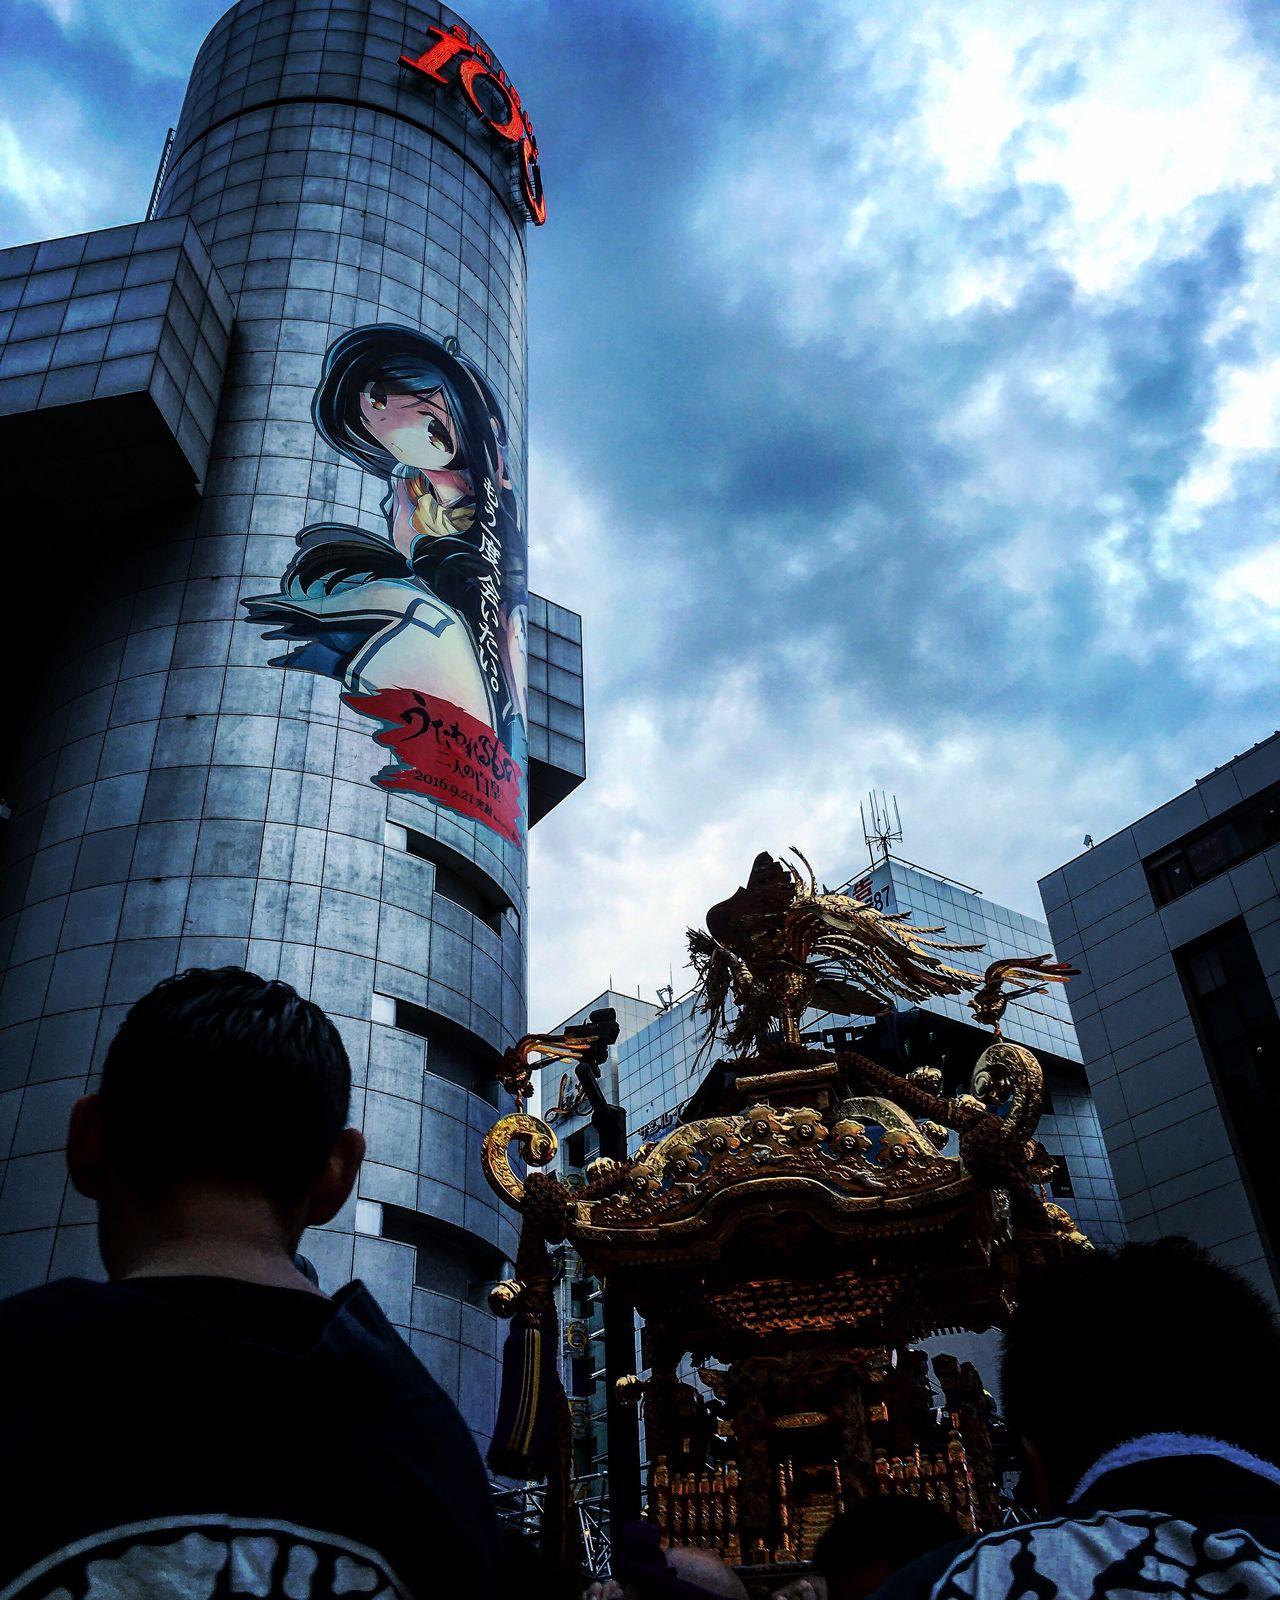 Shibuya AArchitecturebBuilding ExteriorbBuilt StructuresSkyAArt And CraftcCloud - SkyhHuman RepresentationLLow Angle ViewCCityrReal PeopleSStatuetTravel DestinationssSculpturesSkyscraperoOutdoorsdDayEEmbrace Urban LifeTokyo Japan